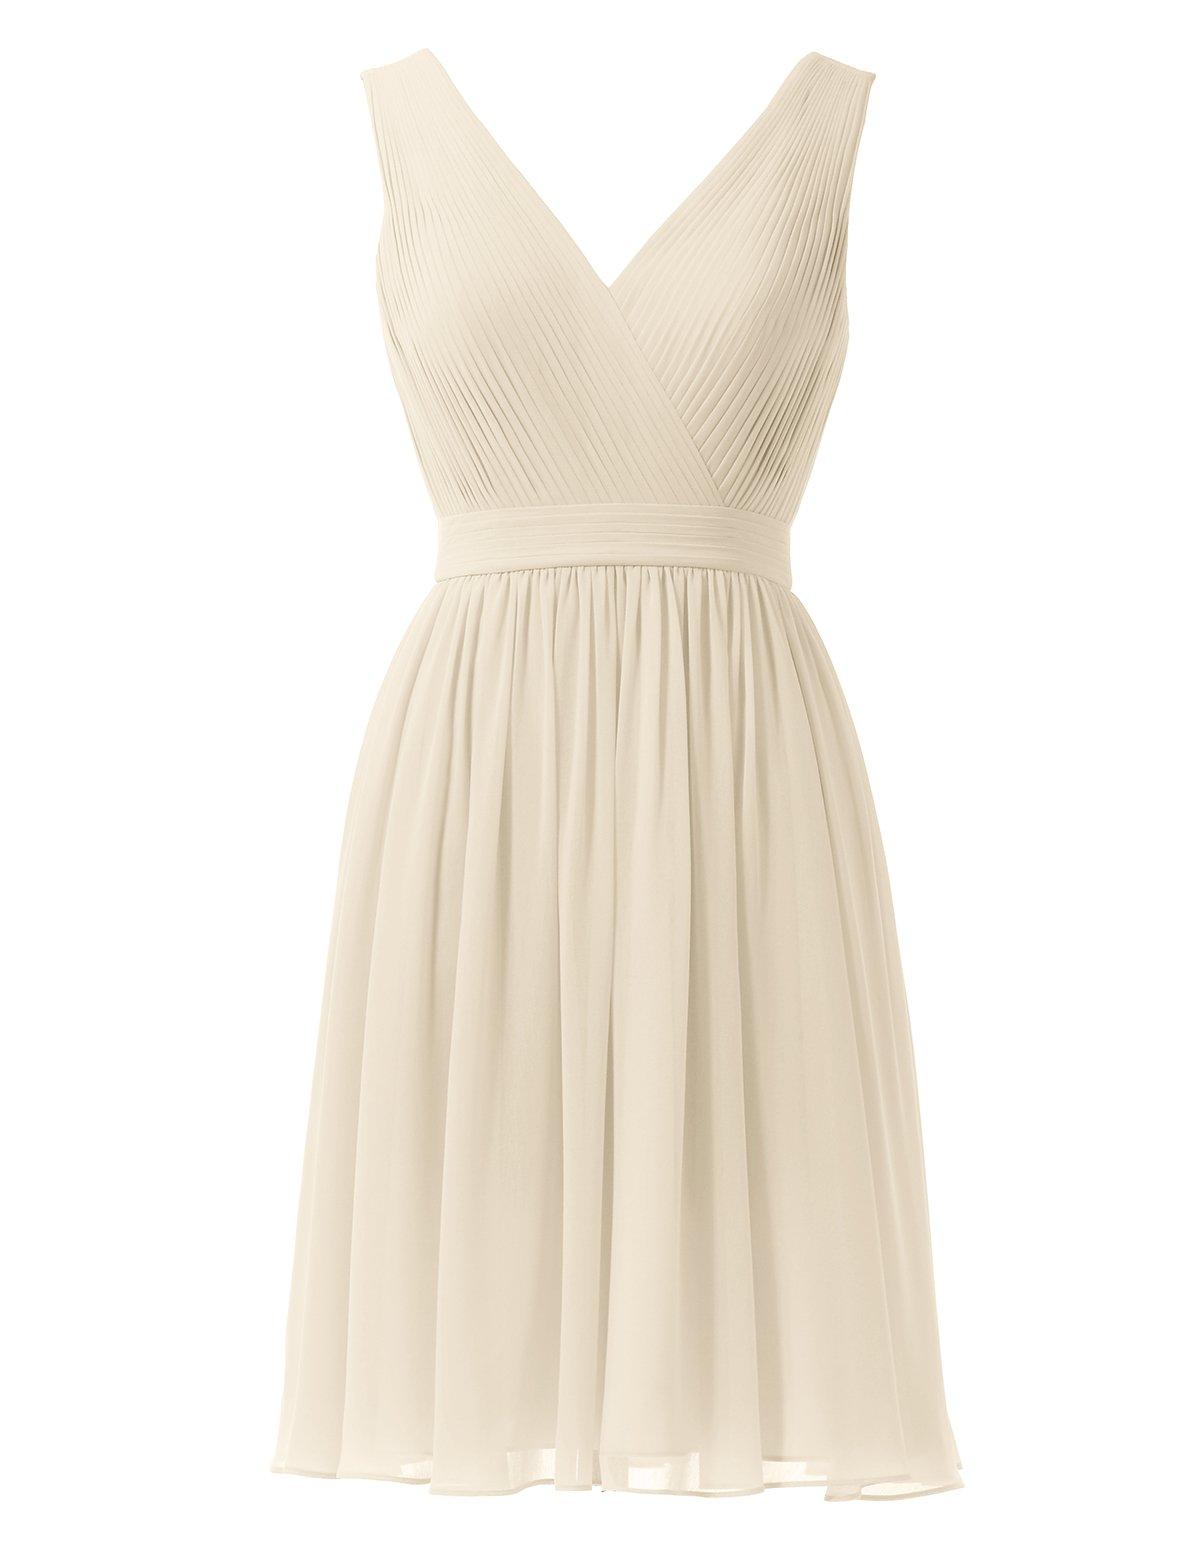 Alicepub Chiffon Bridesmaid Dresses Short Prom Gown Evening Party Dress V-Neck